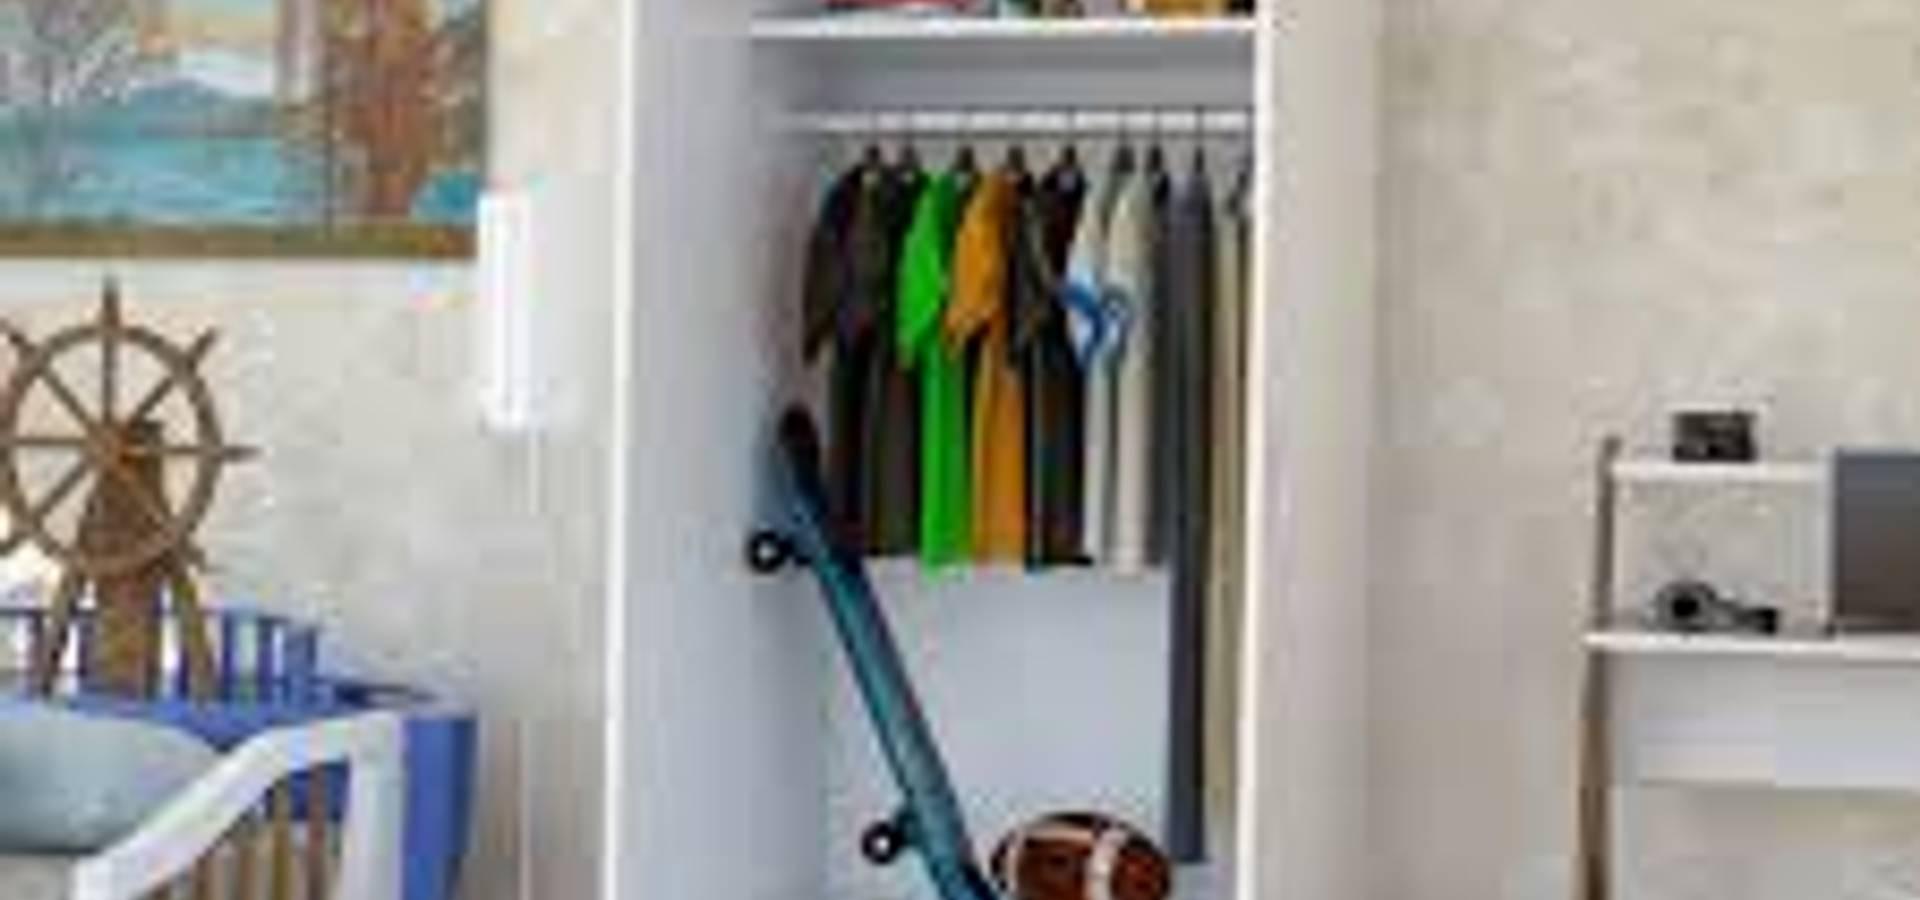 5333514937,marangoz servisi,mobilya montaj servisi,marangoz ustası,